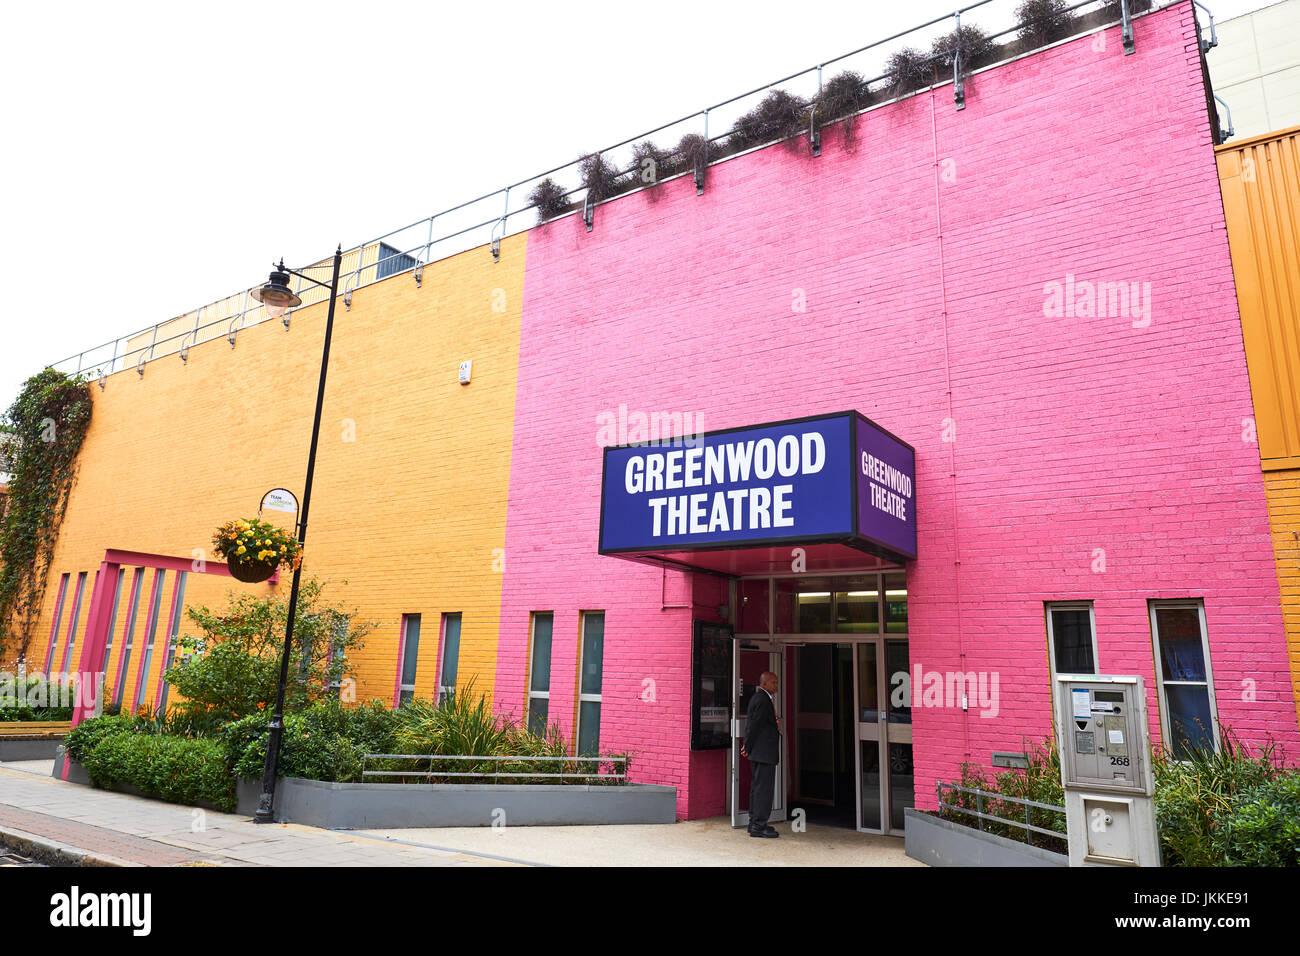 Greenwood Theater, Weston Street, Southwark, London, UK Stockbild